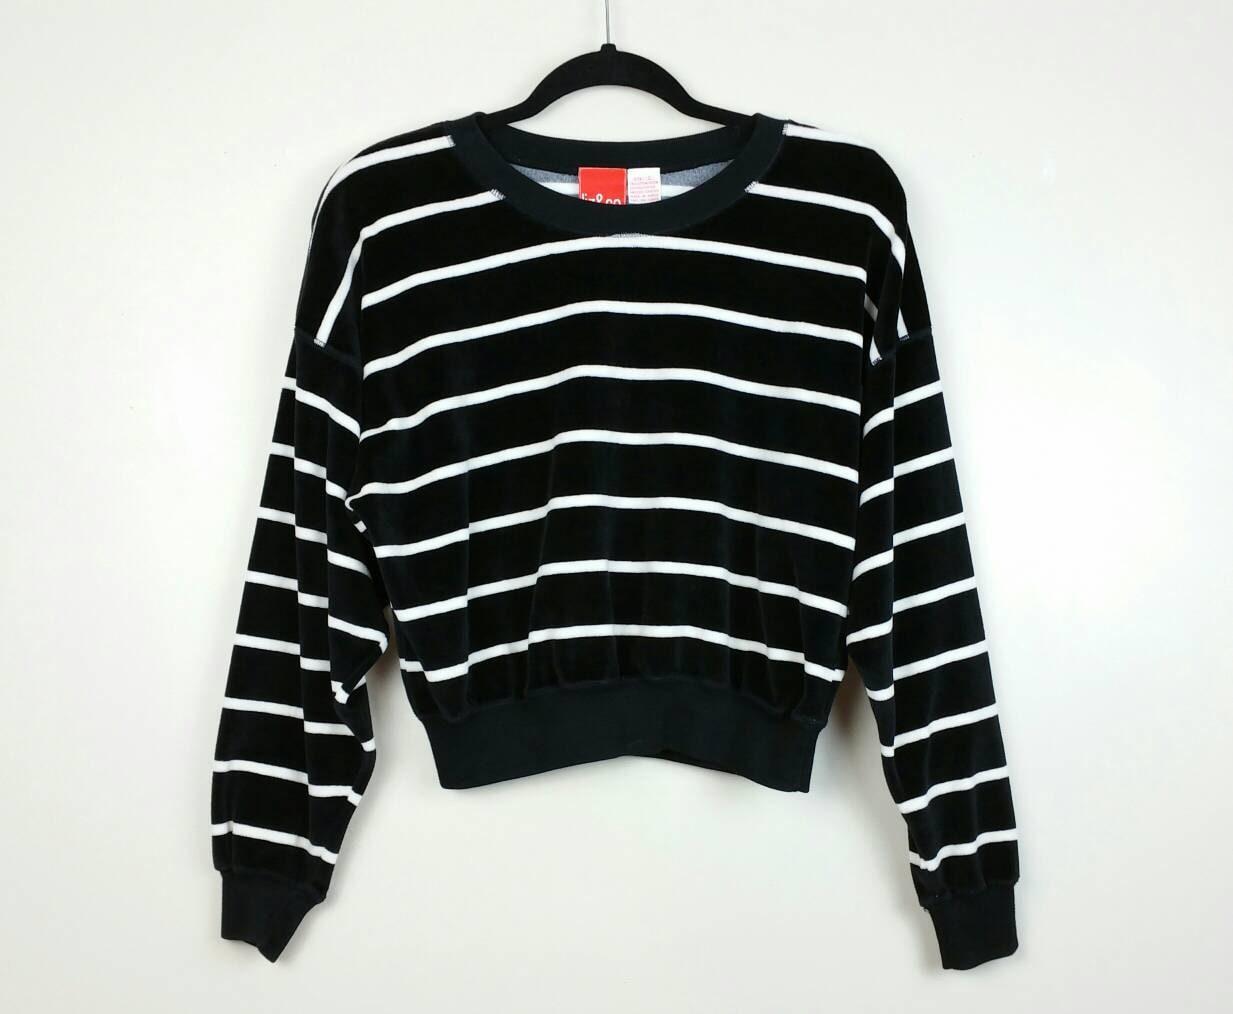 90s vintage velour cropped sweatshirt black and white striped ... eb6651cea